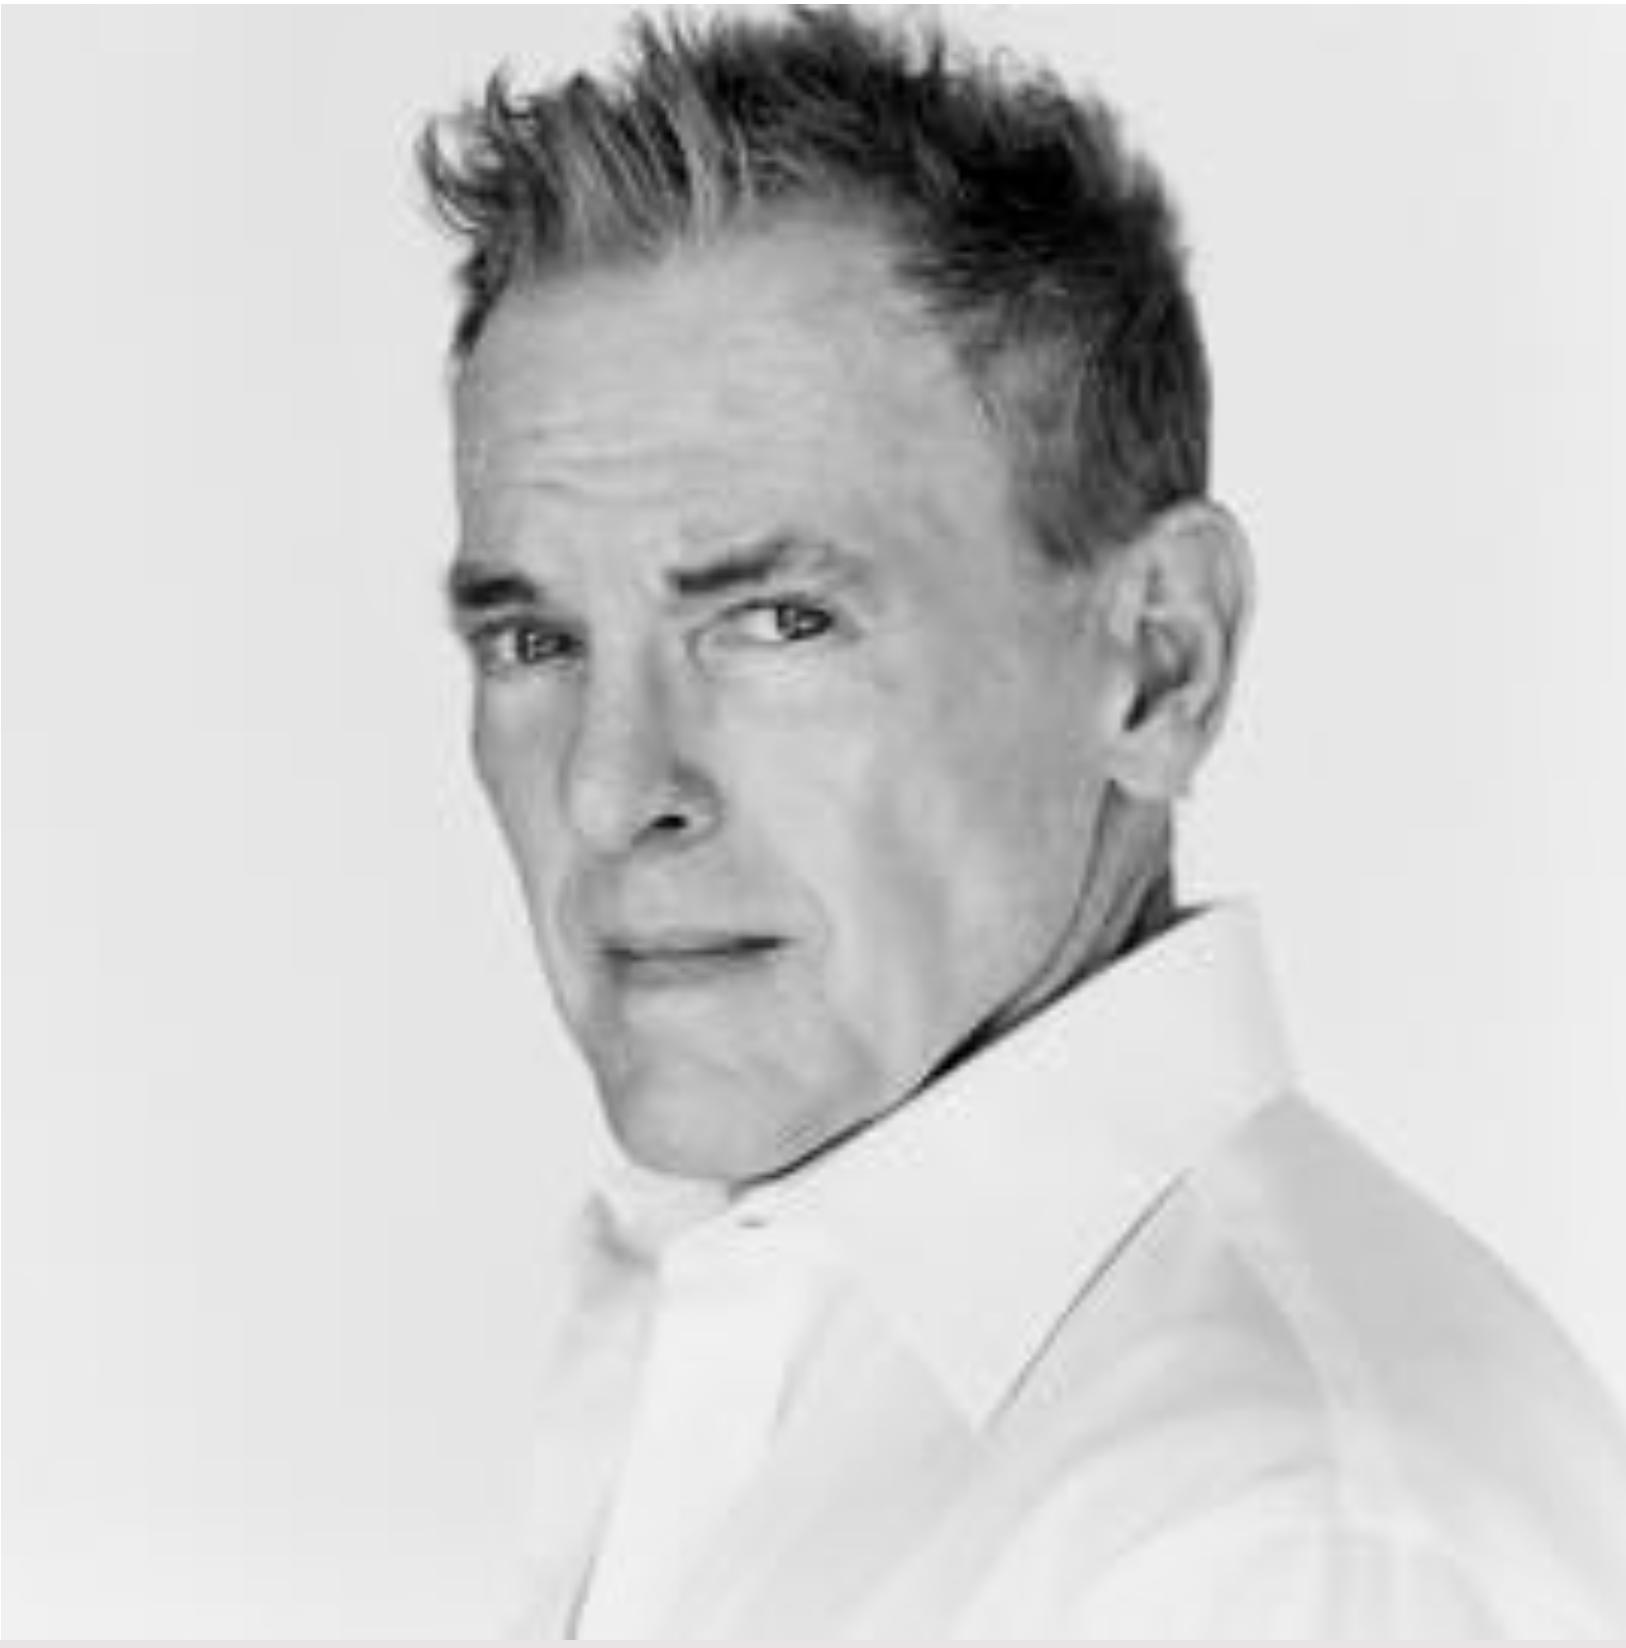 Author - William Jack Sibley